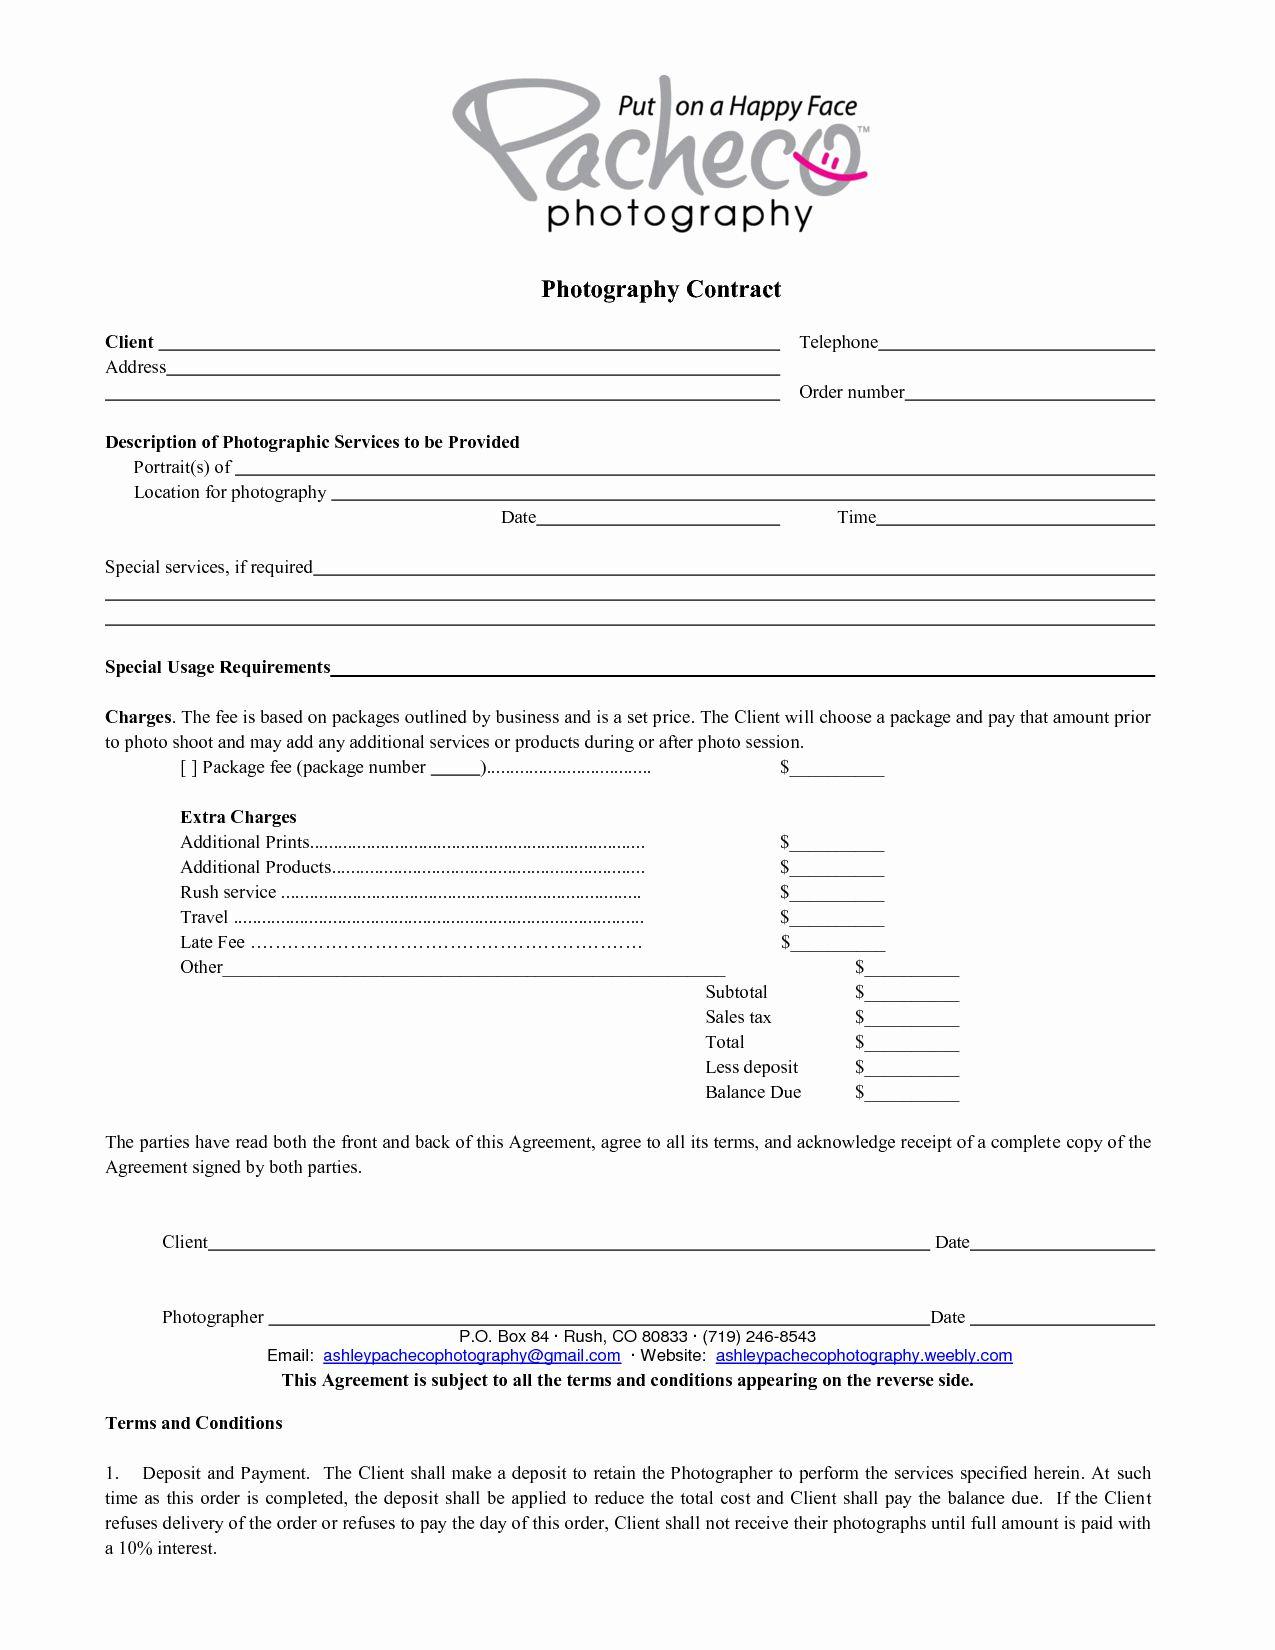 000 Wonderful Portrait Photography Contract Template Sample  Pdf AustraliaFull